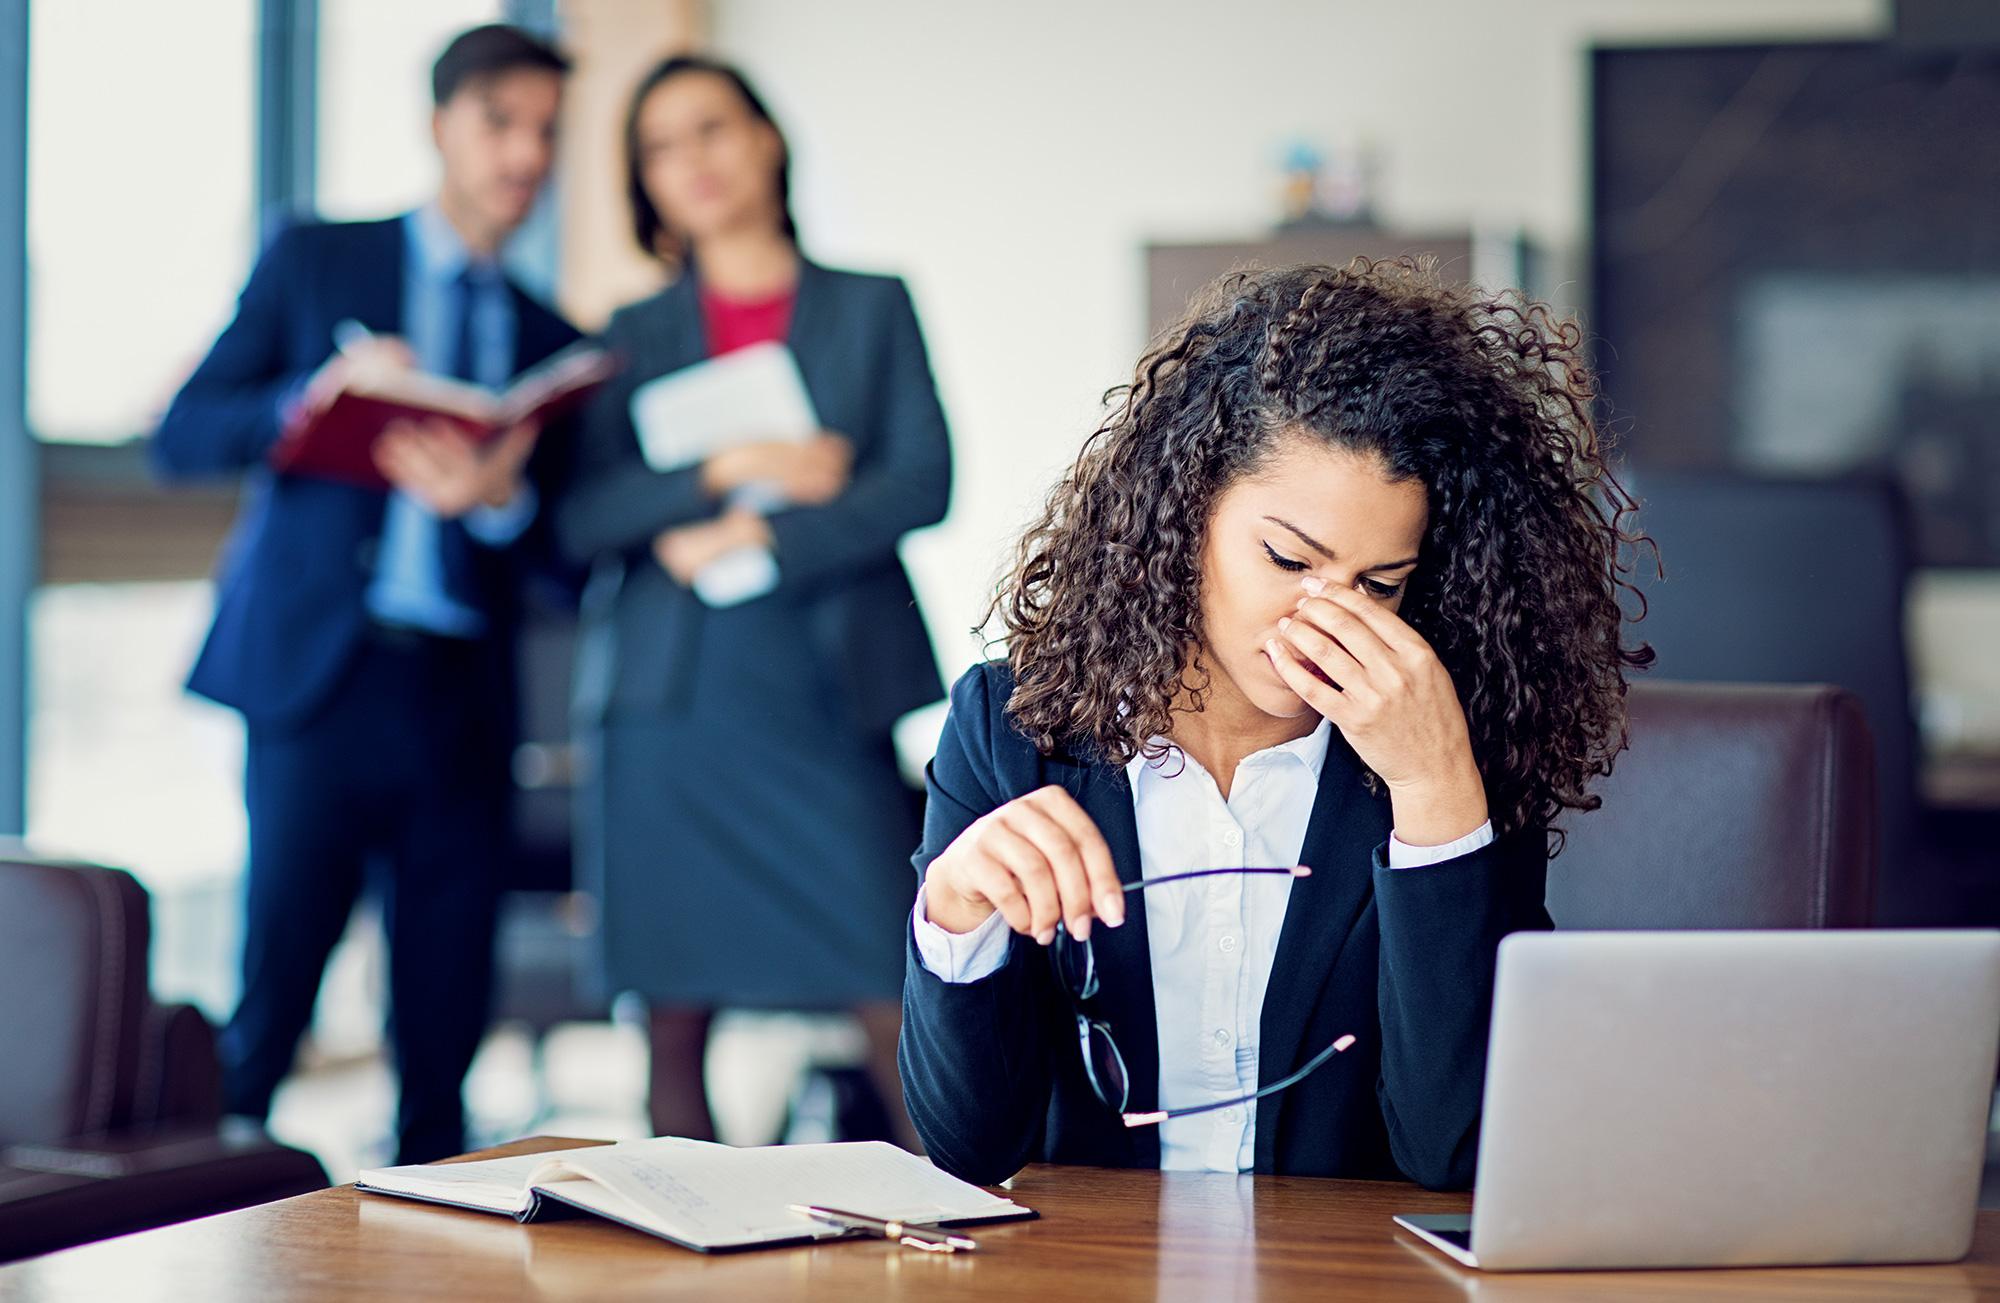 work-based-stress-solutions.jpg